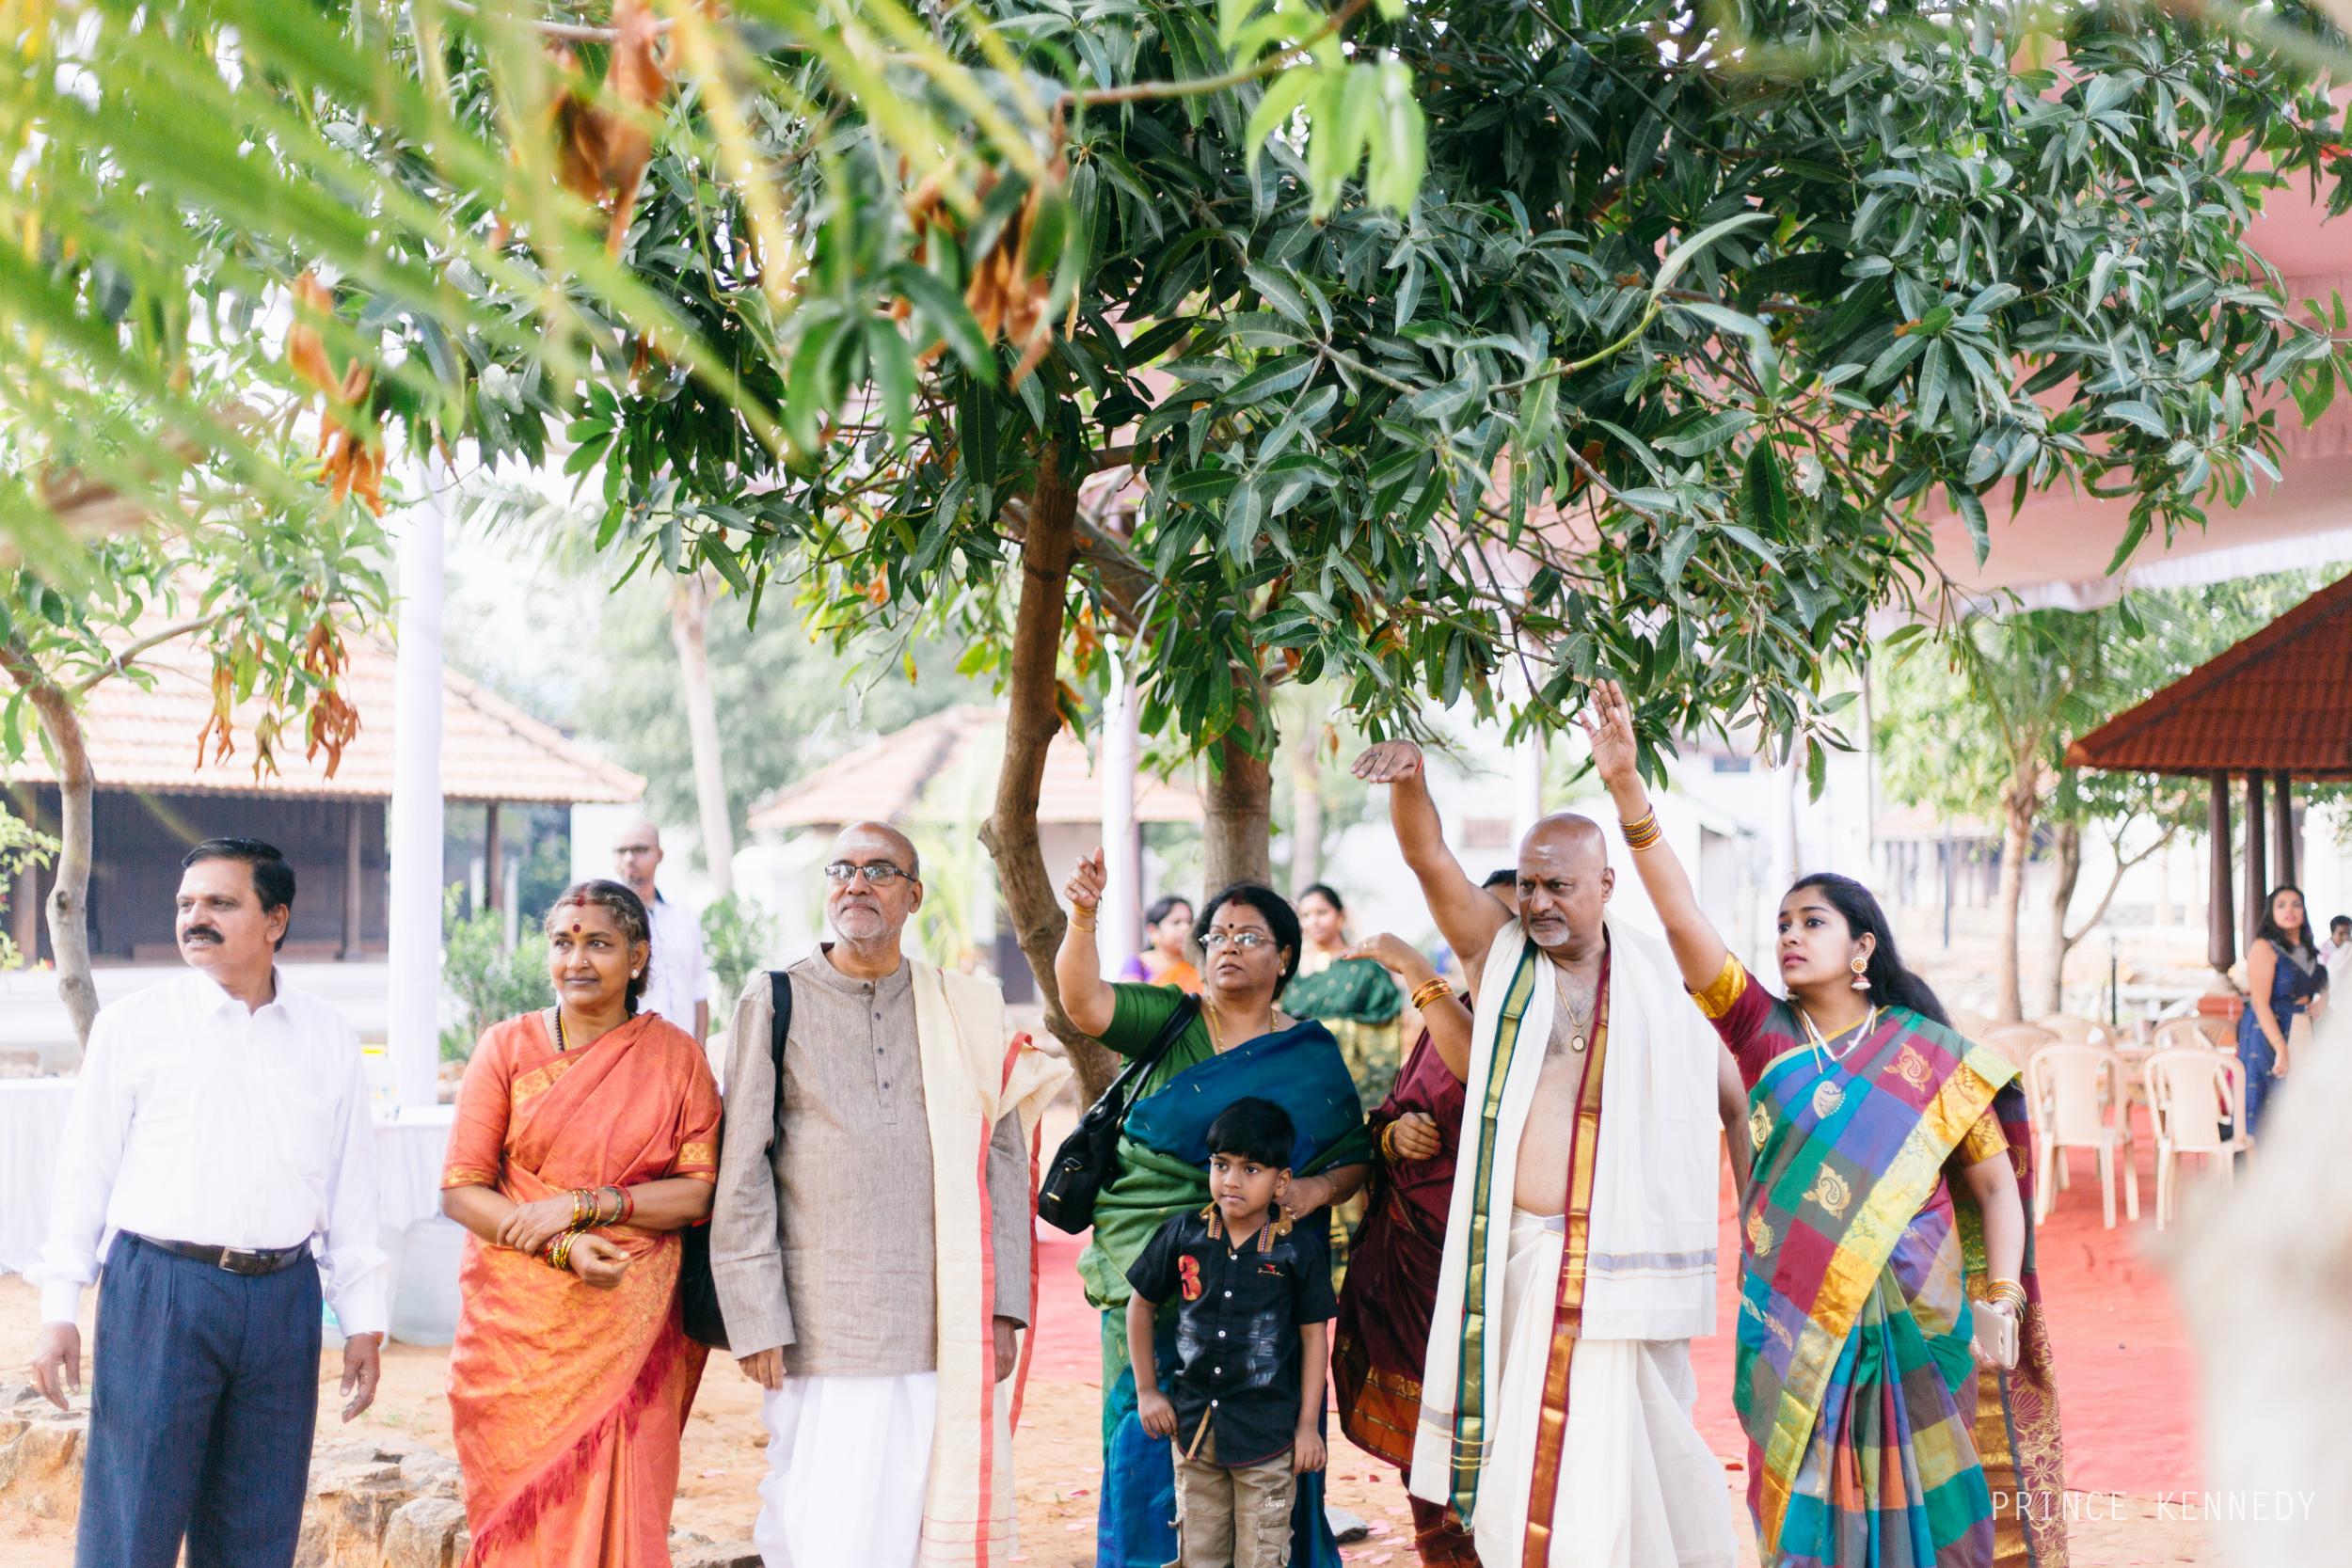 Athmajja-Nithesh-Engagement-Couple-Portrait-Portraiture-Wedding-Couple-Portrait-Chennai-Photographer-Candid-Photography-Destination-Best-Prince-Kennedy-Photography-60.jpg